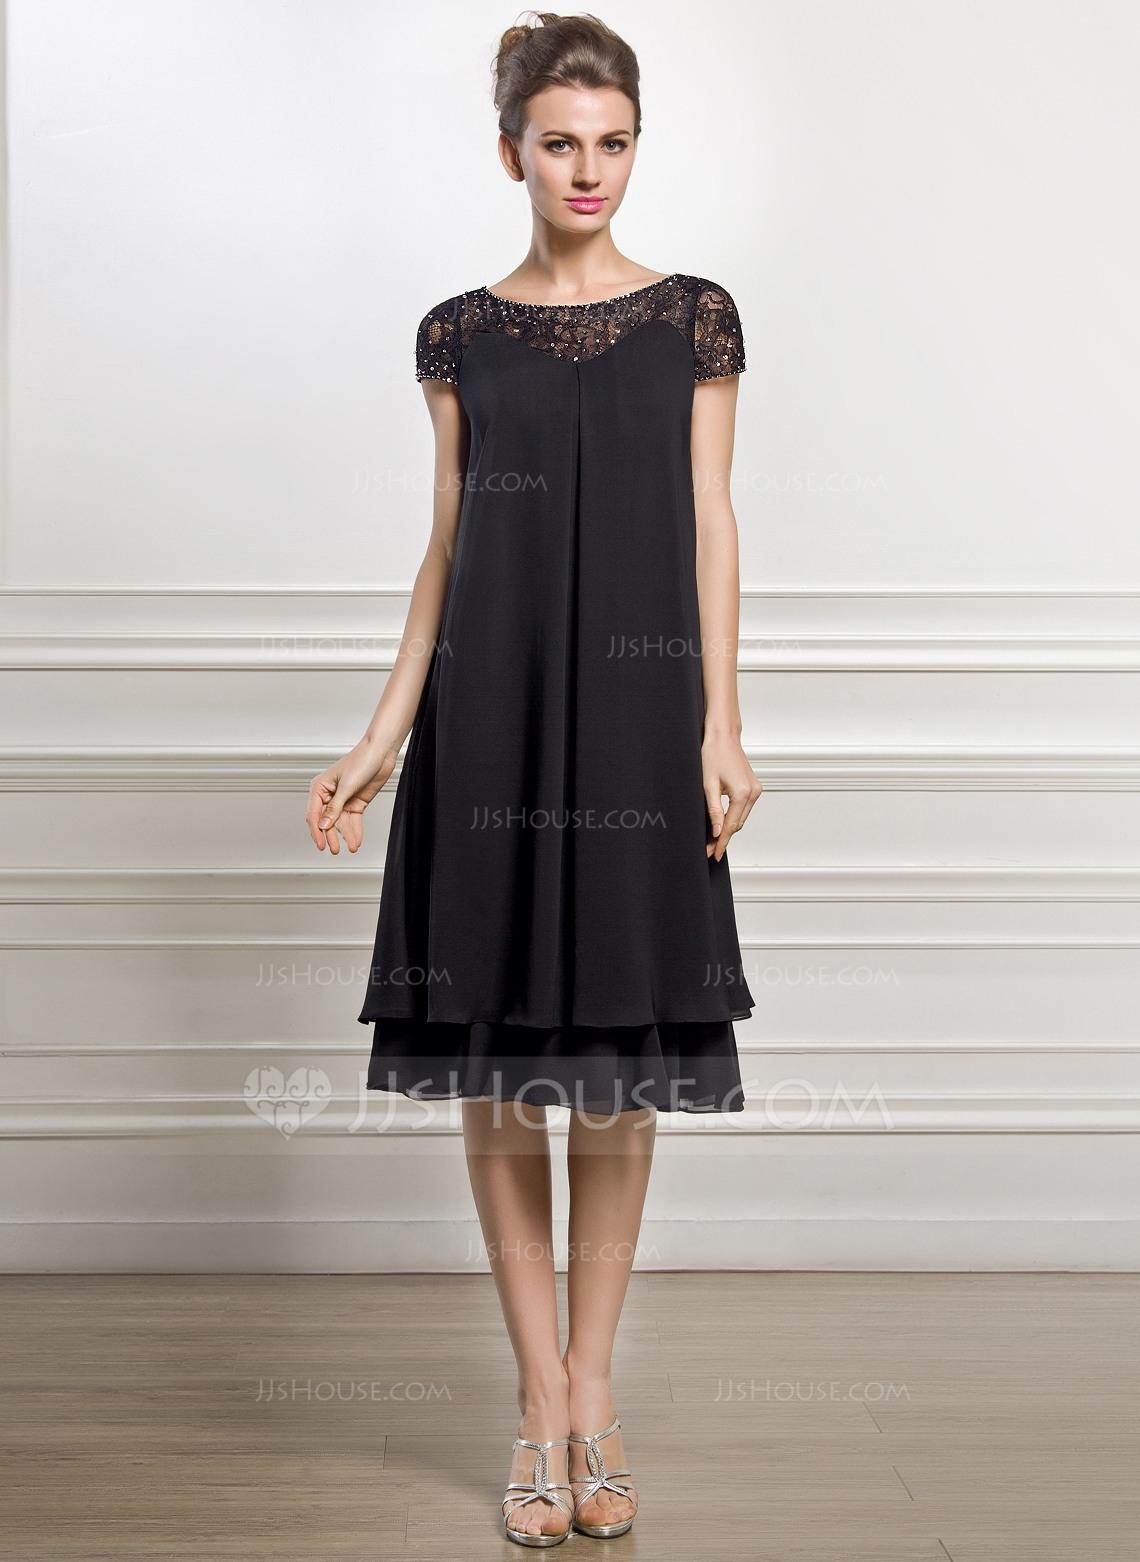 13 Perfekt Bodenlanges Schwarzes Kleid SpezialgebietAbend Coolste Bodenlanges Schwarzes Kleid Galerie